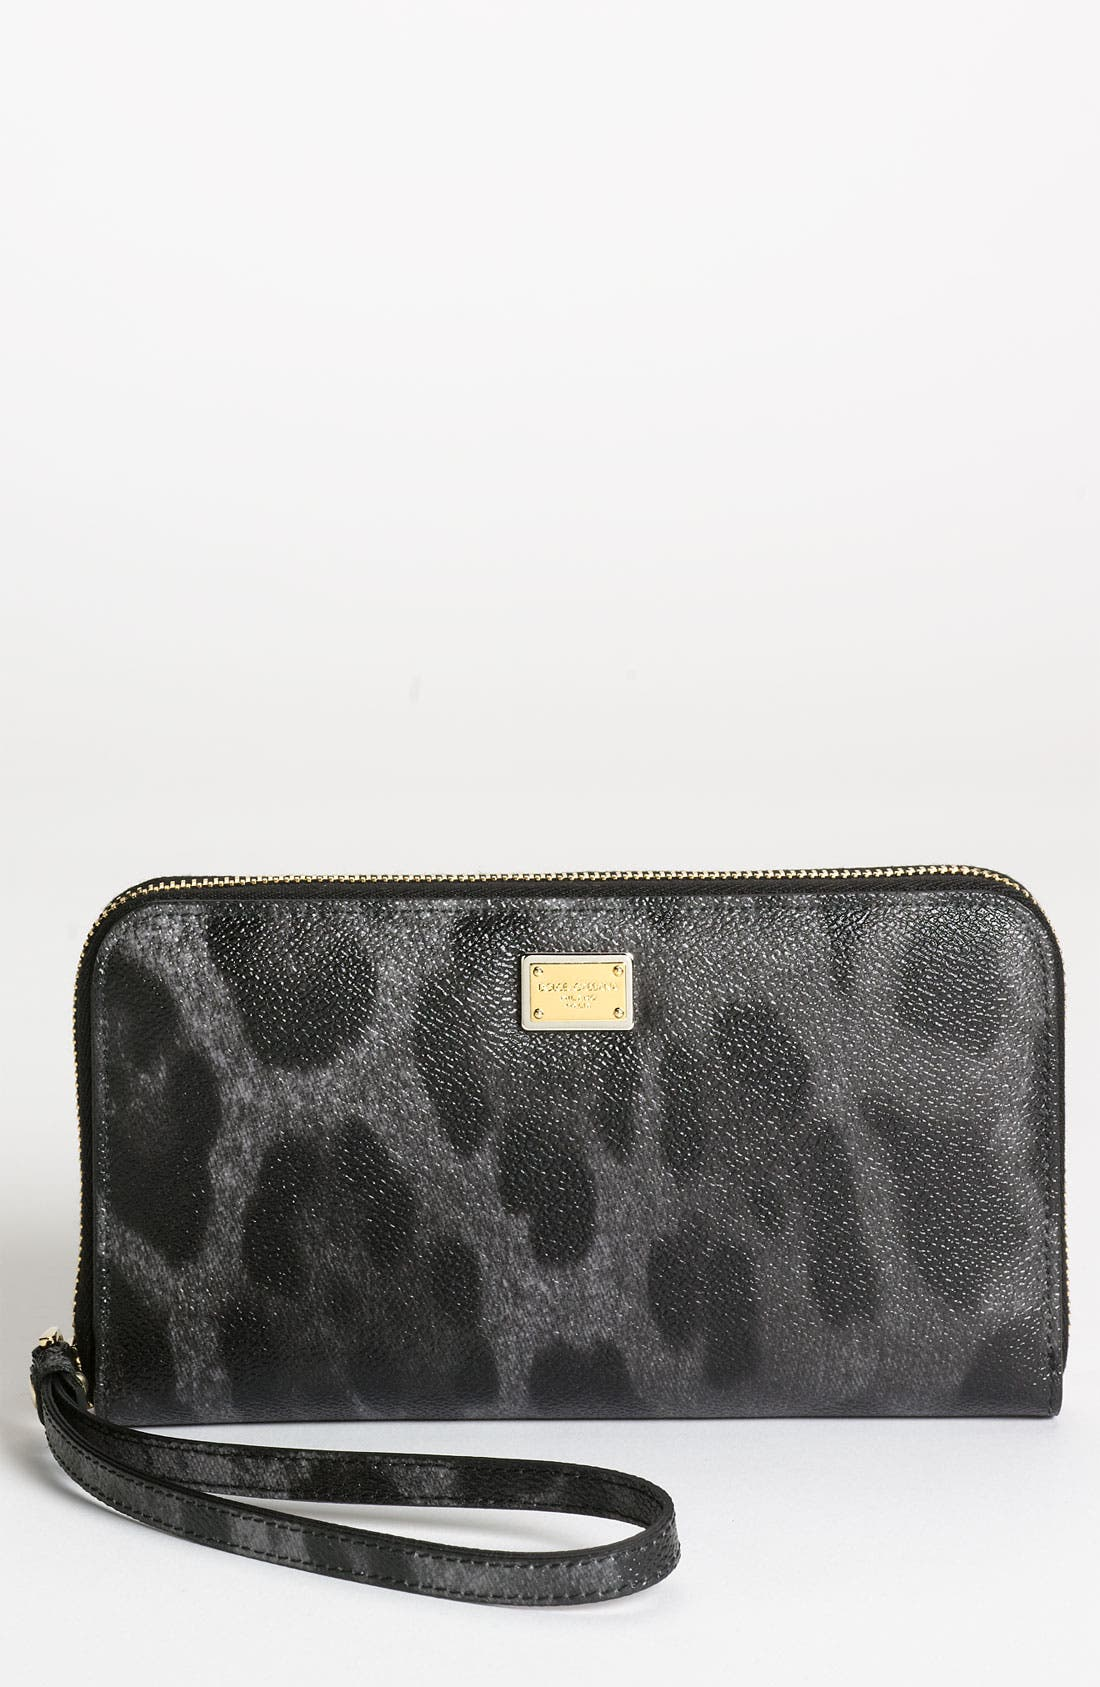 Main Image - Dolce&Gabbana Zip Around Wristlet